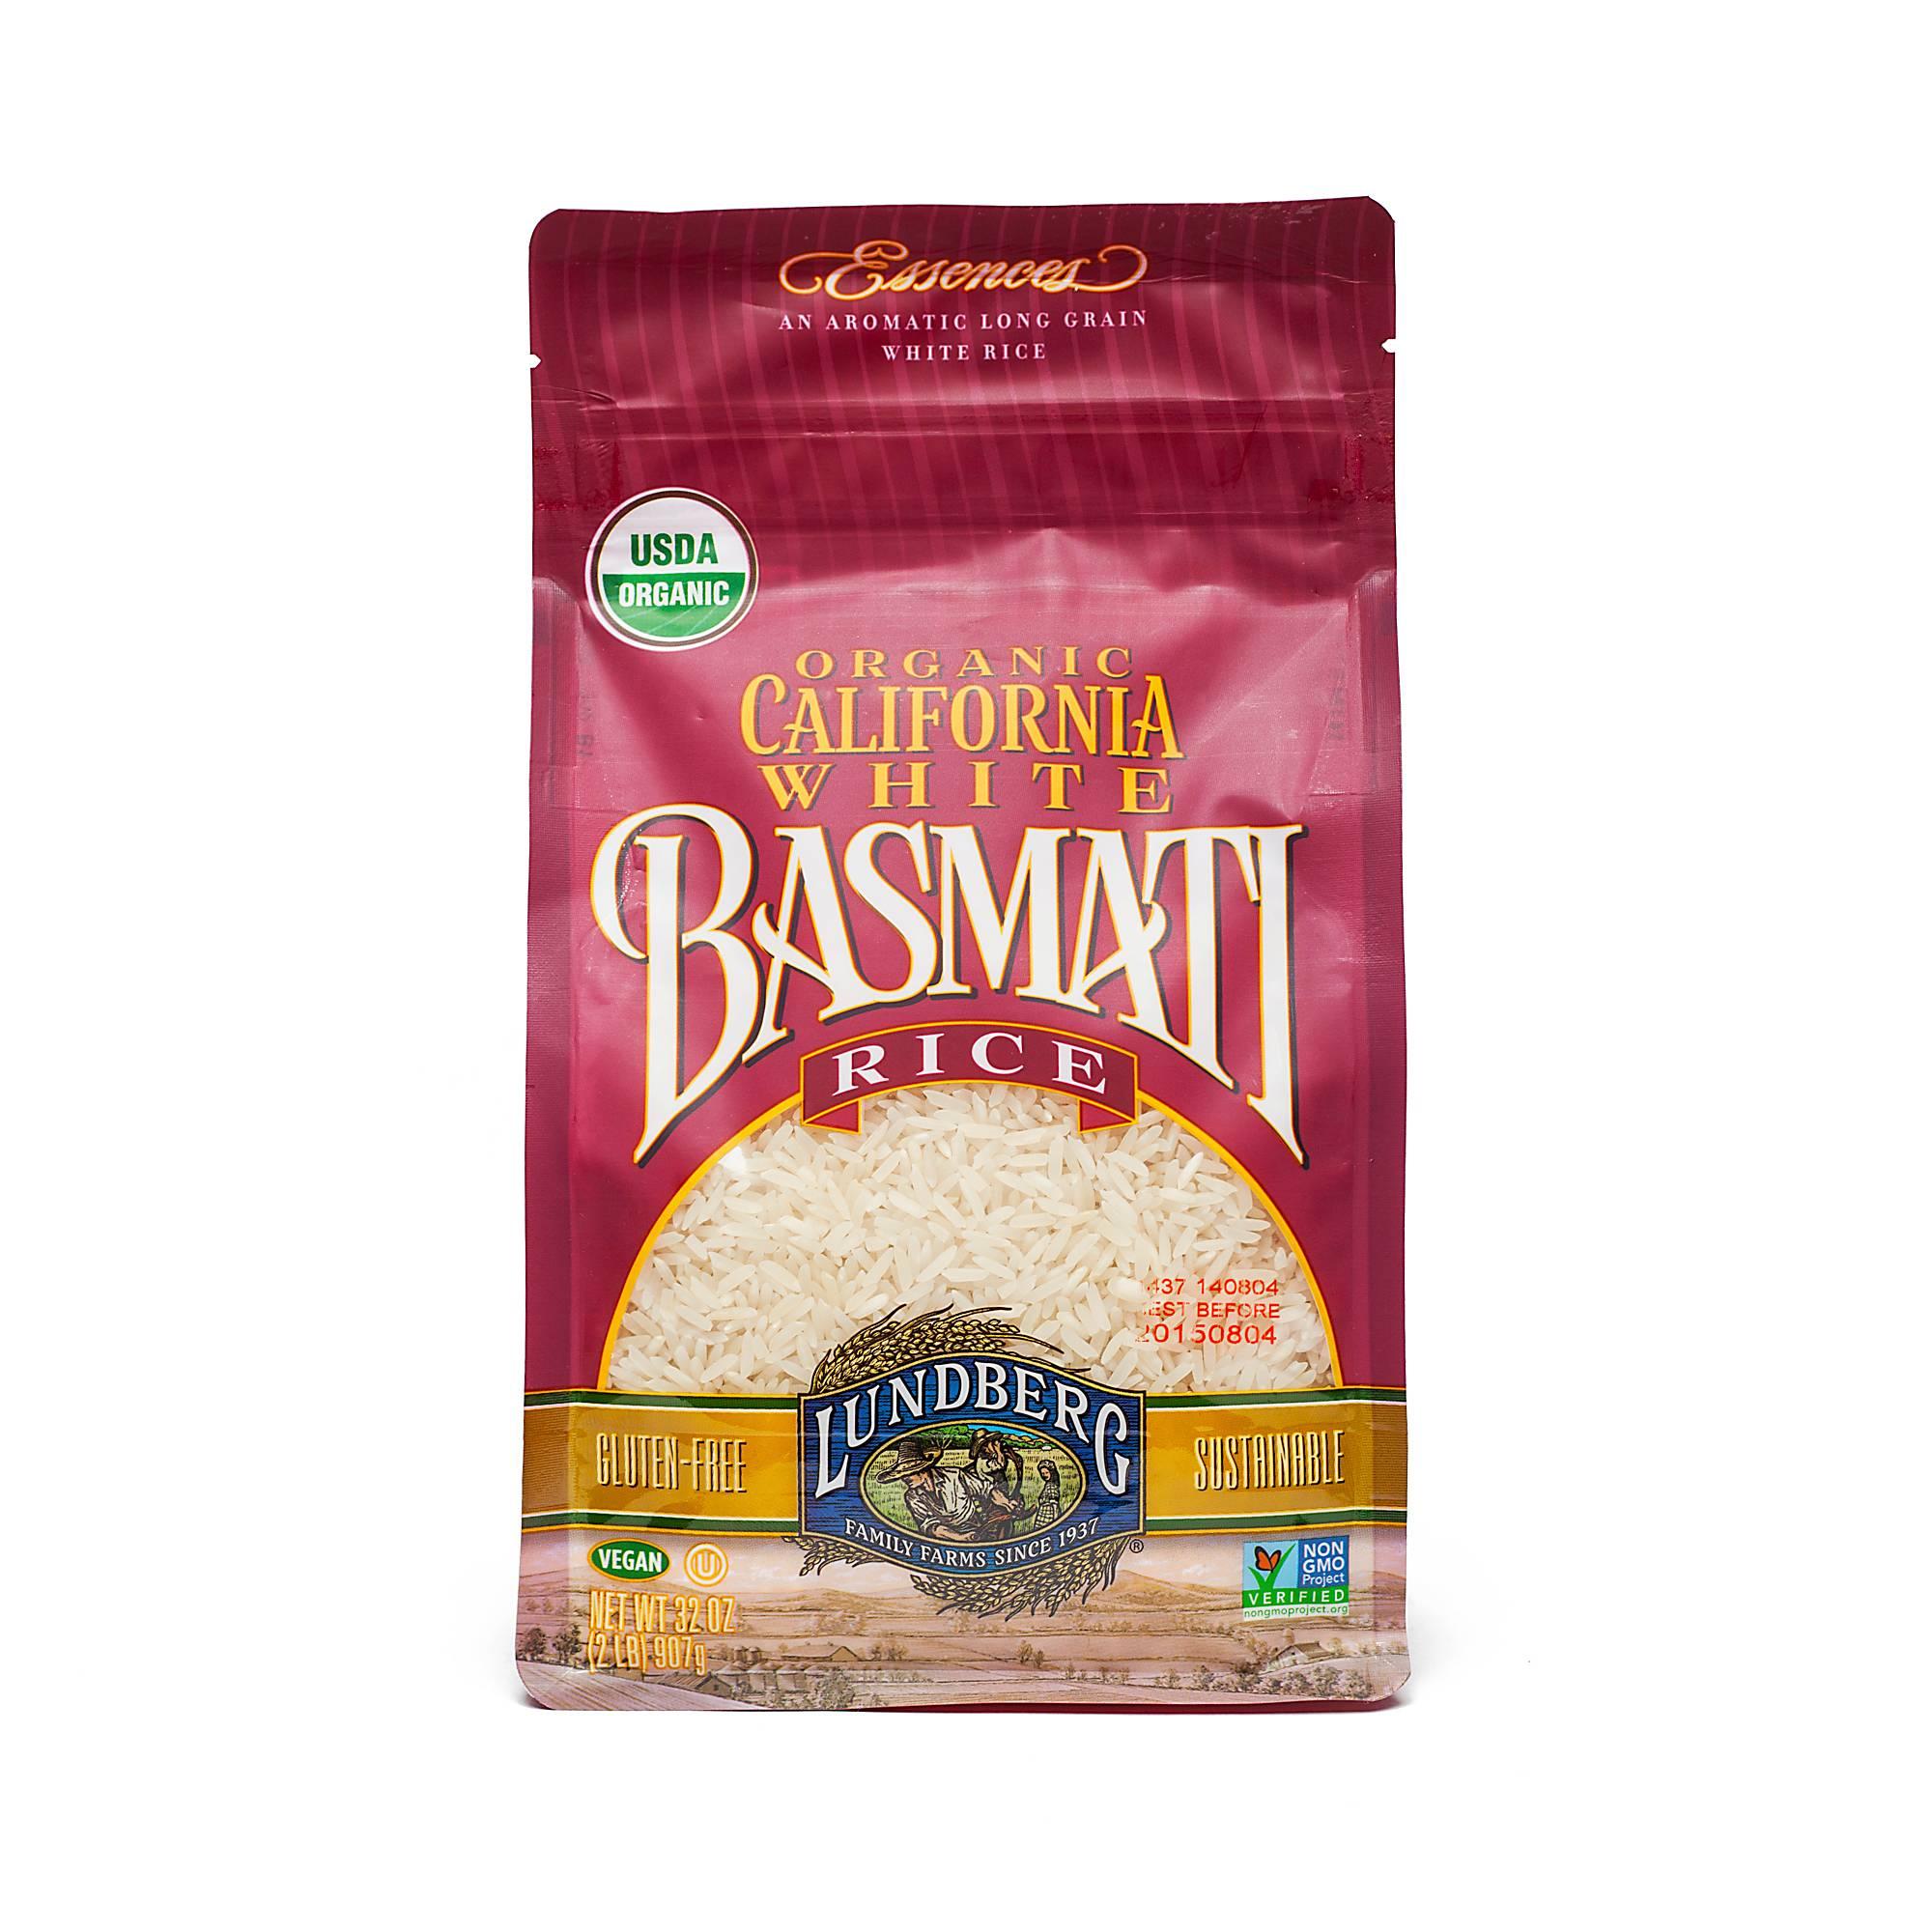 Lundberg Organic California White Basmati Rice - Thrive Market